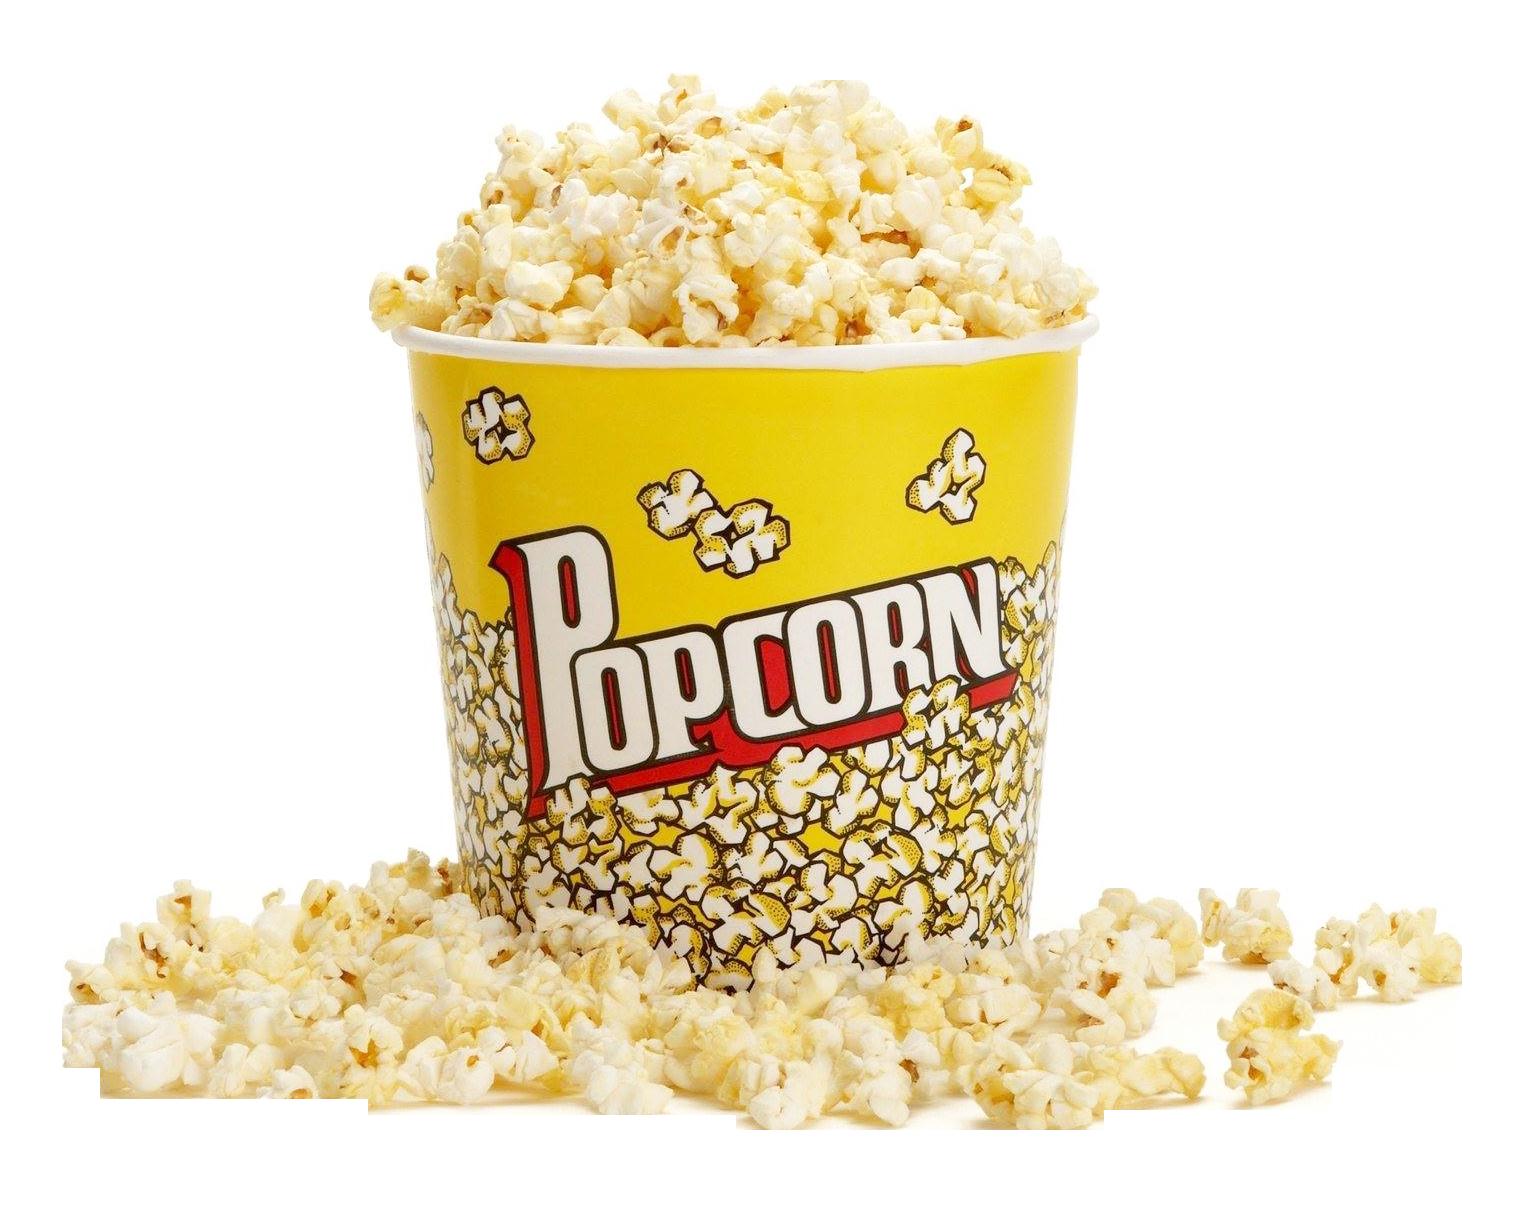 Popcorn PNG Image - PurePNG   Free transparent CC0 PNG ...